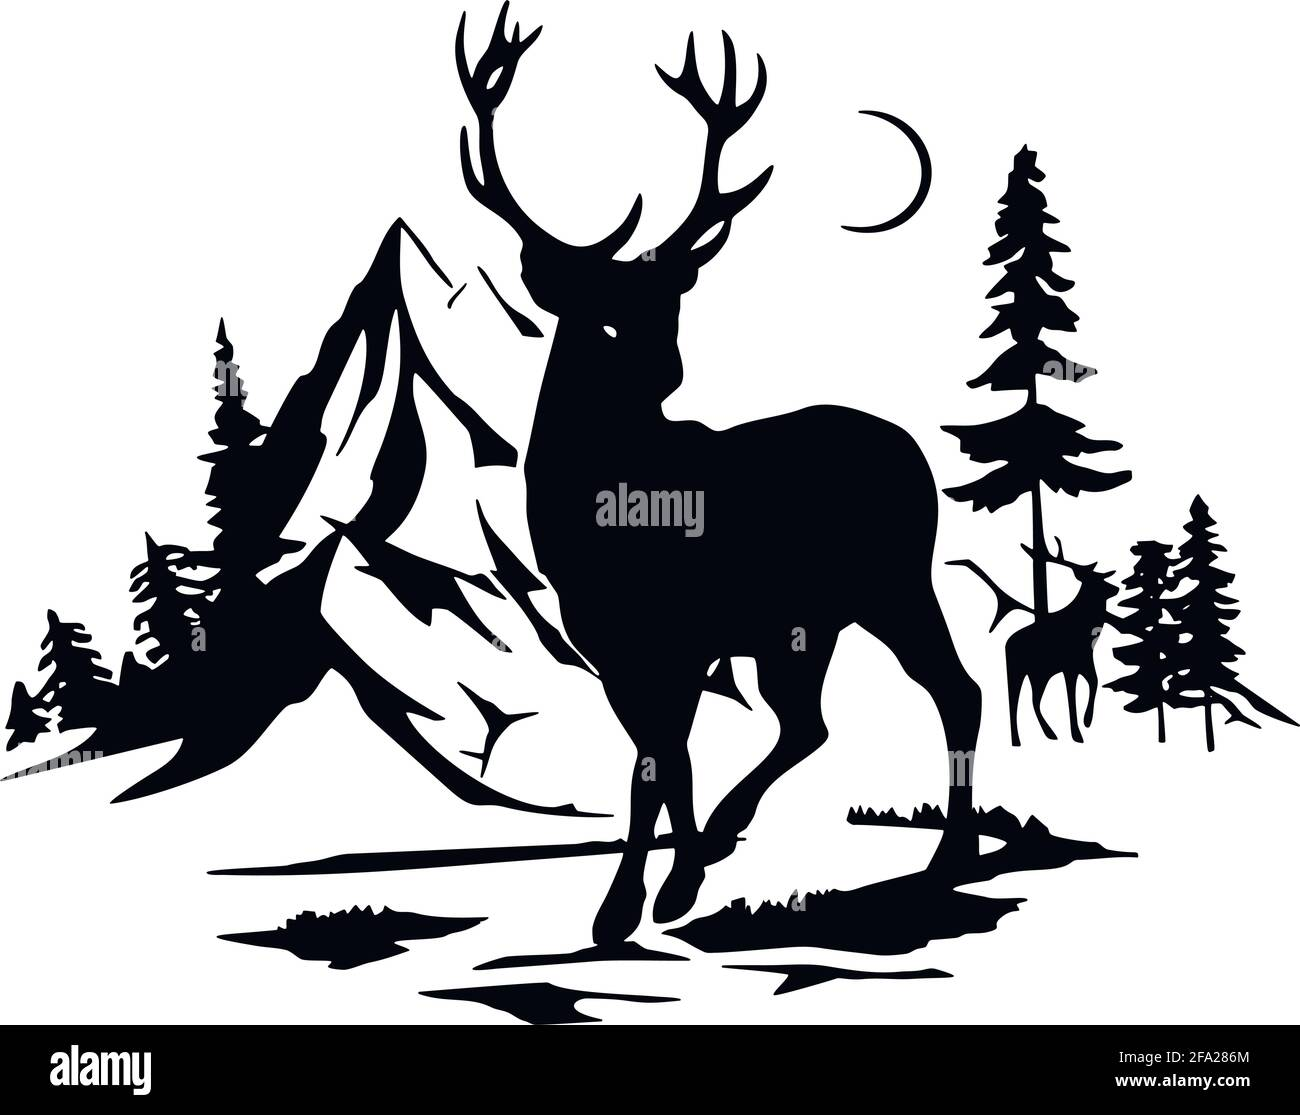 Deer - Wildlife Schablonen - Deer Silhouette, Wildlife Cliparts isoliert auf Weiß Stock Vektor